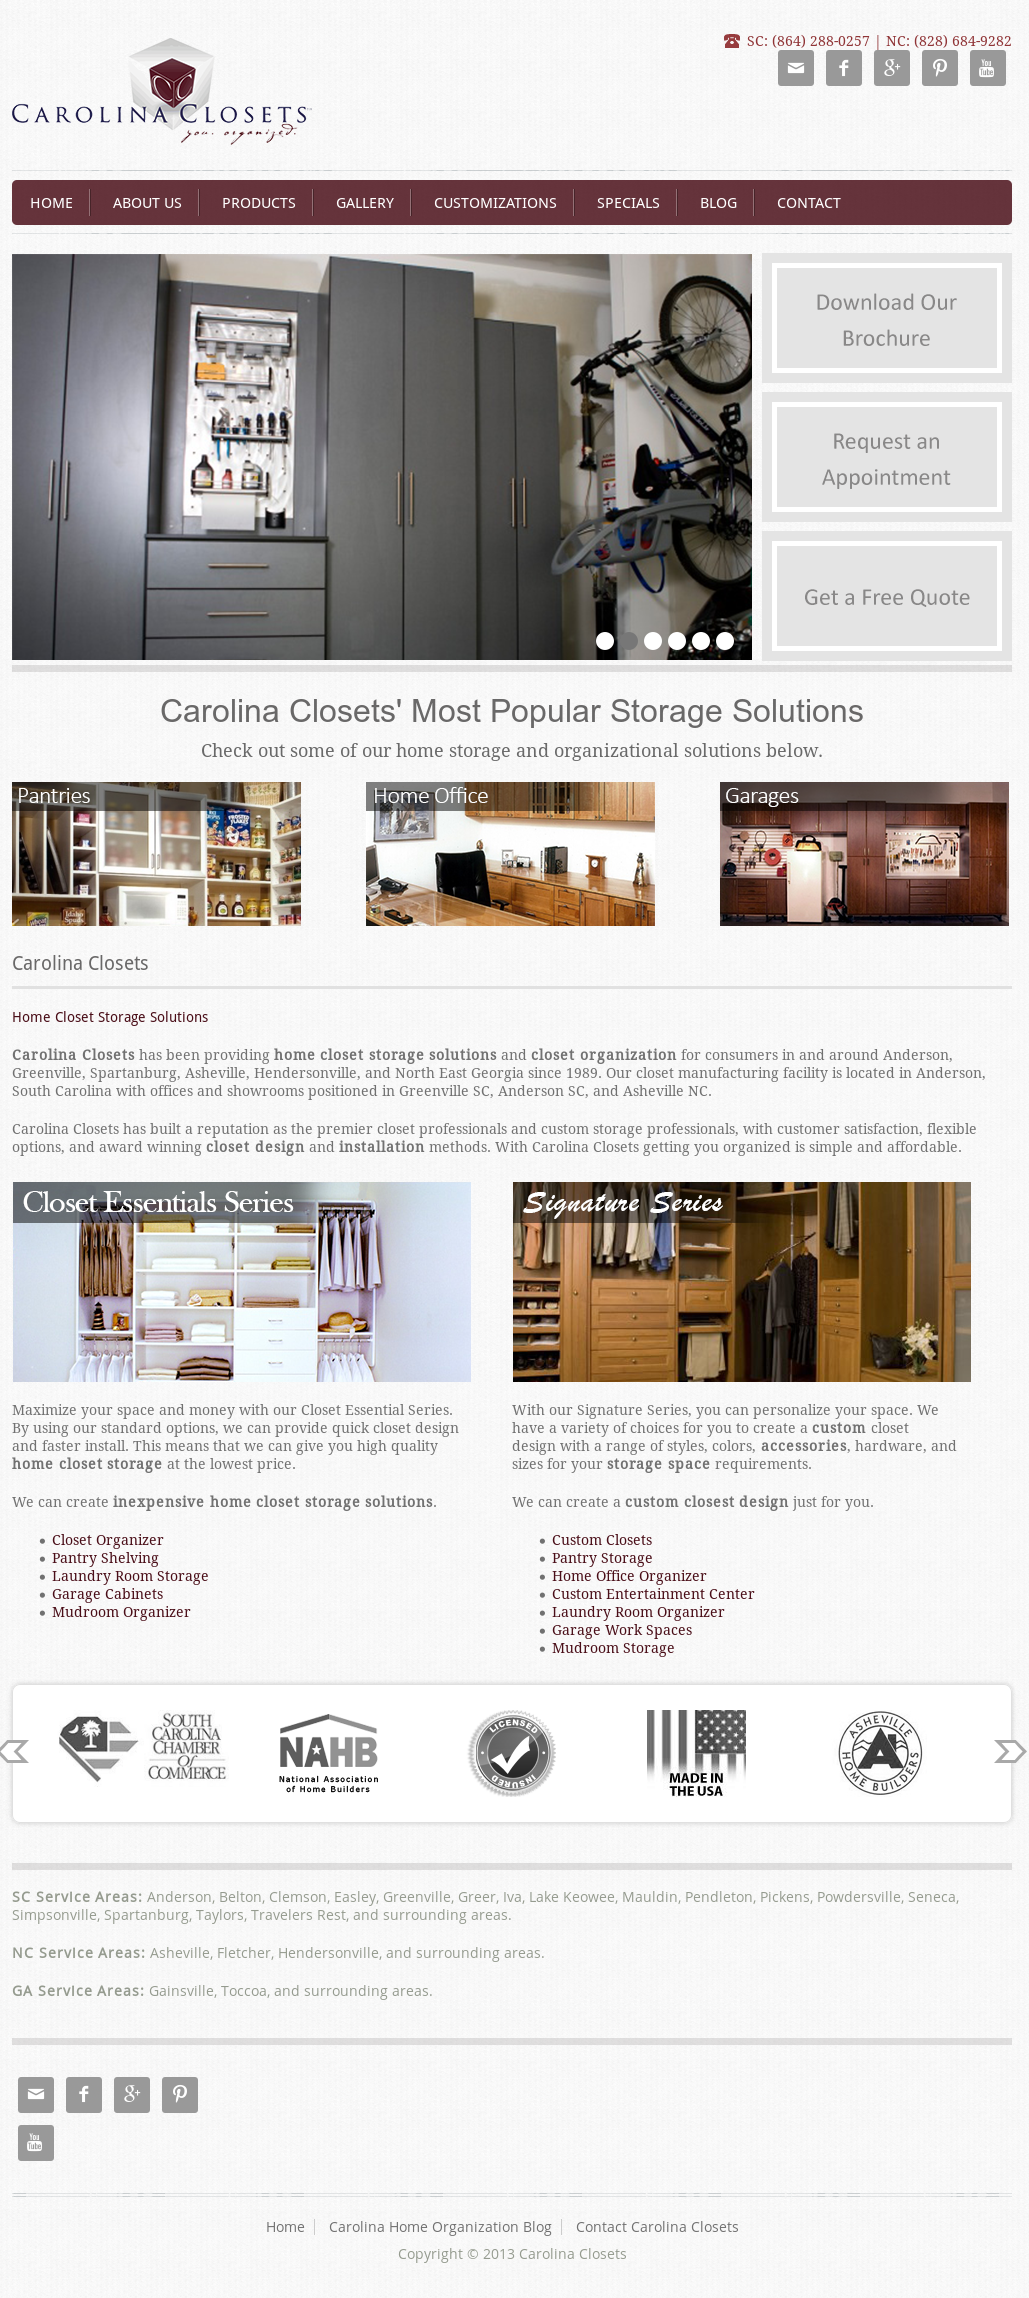 Carolina Closets Competitors, Revenue And Employees   Owler Company Profile